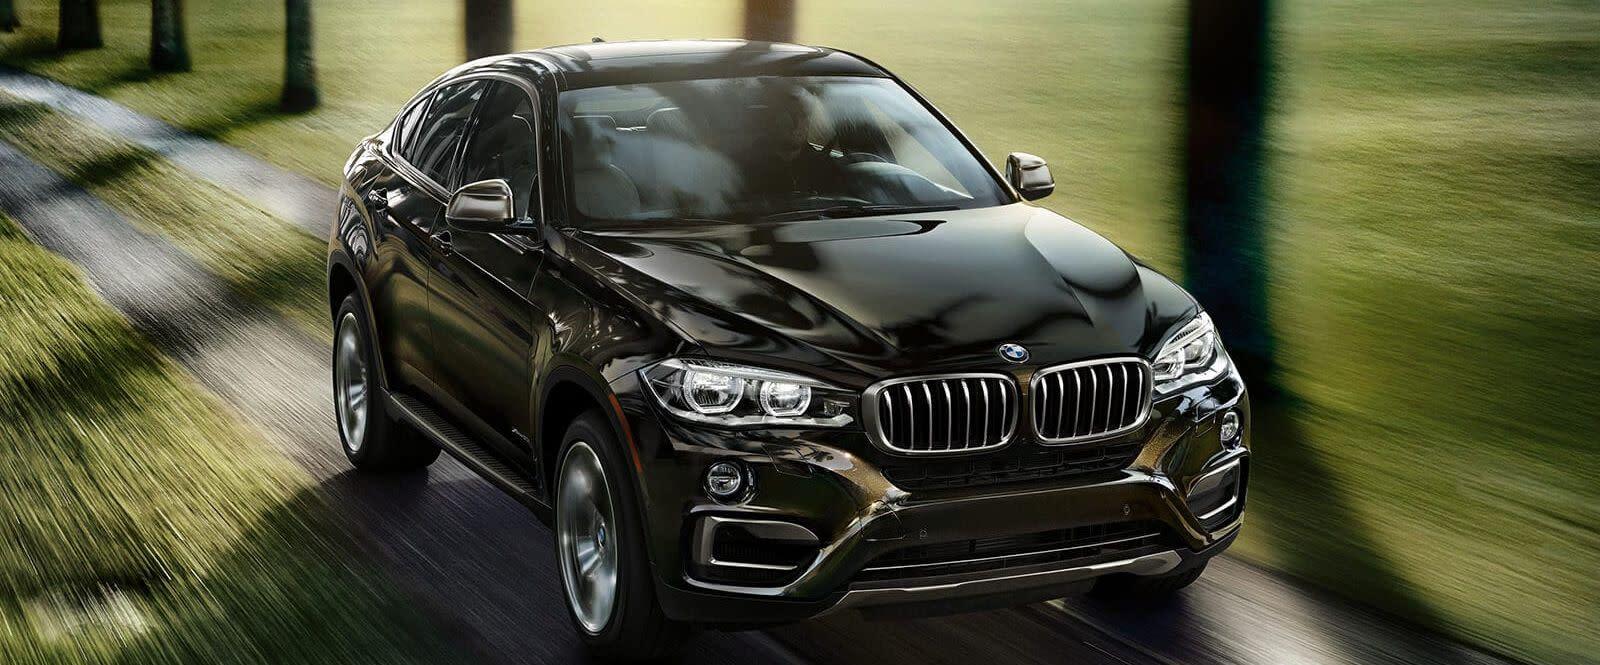 2019 BMW X6 Financing near Sebastian, FL